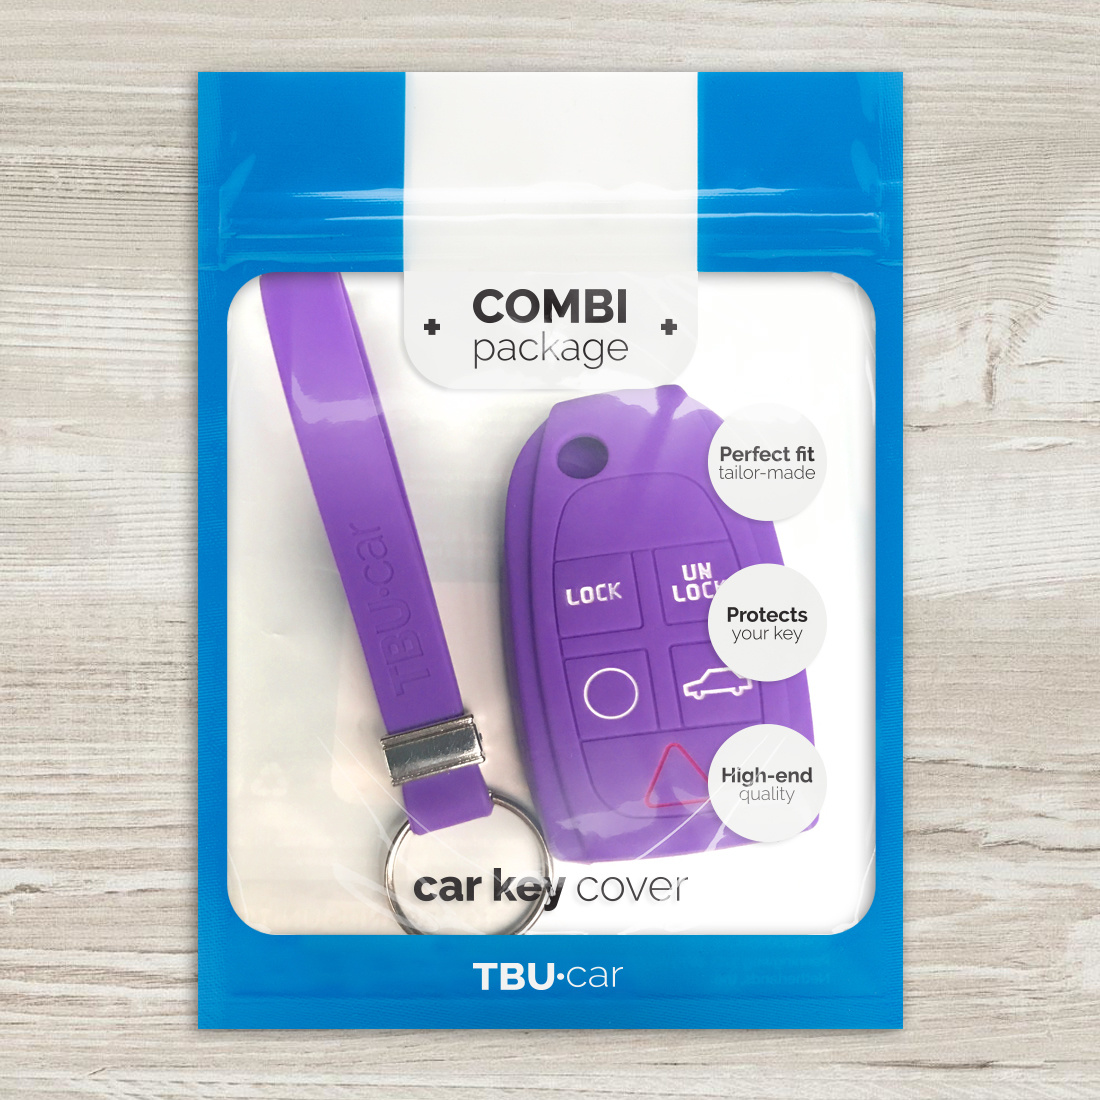 TBU car TBU car Autoschlüssel Hülle kompatibel mit Volvo 5 Tasten - Schutzhülle aus Silikon - Auto Schlüsselhülle Cover in Violett